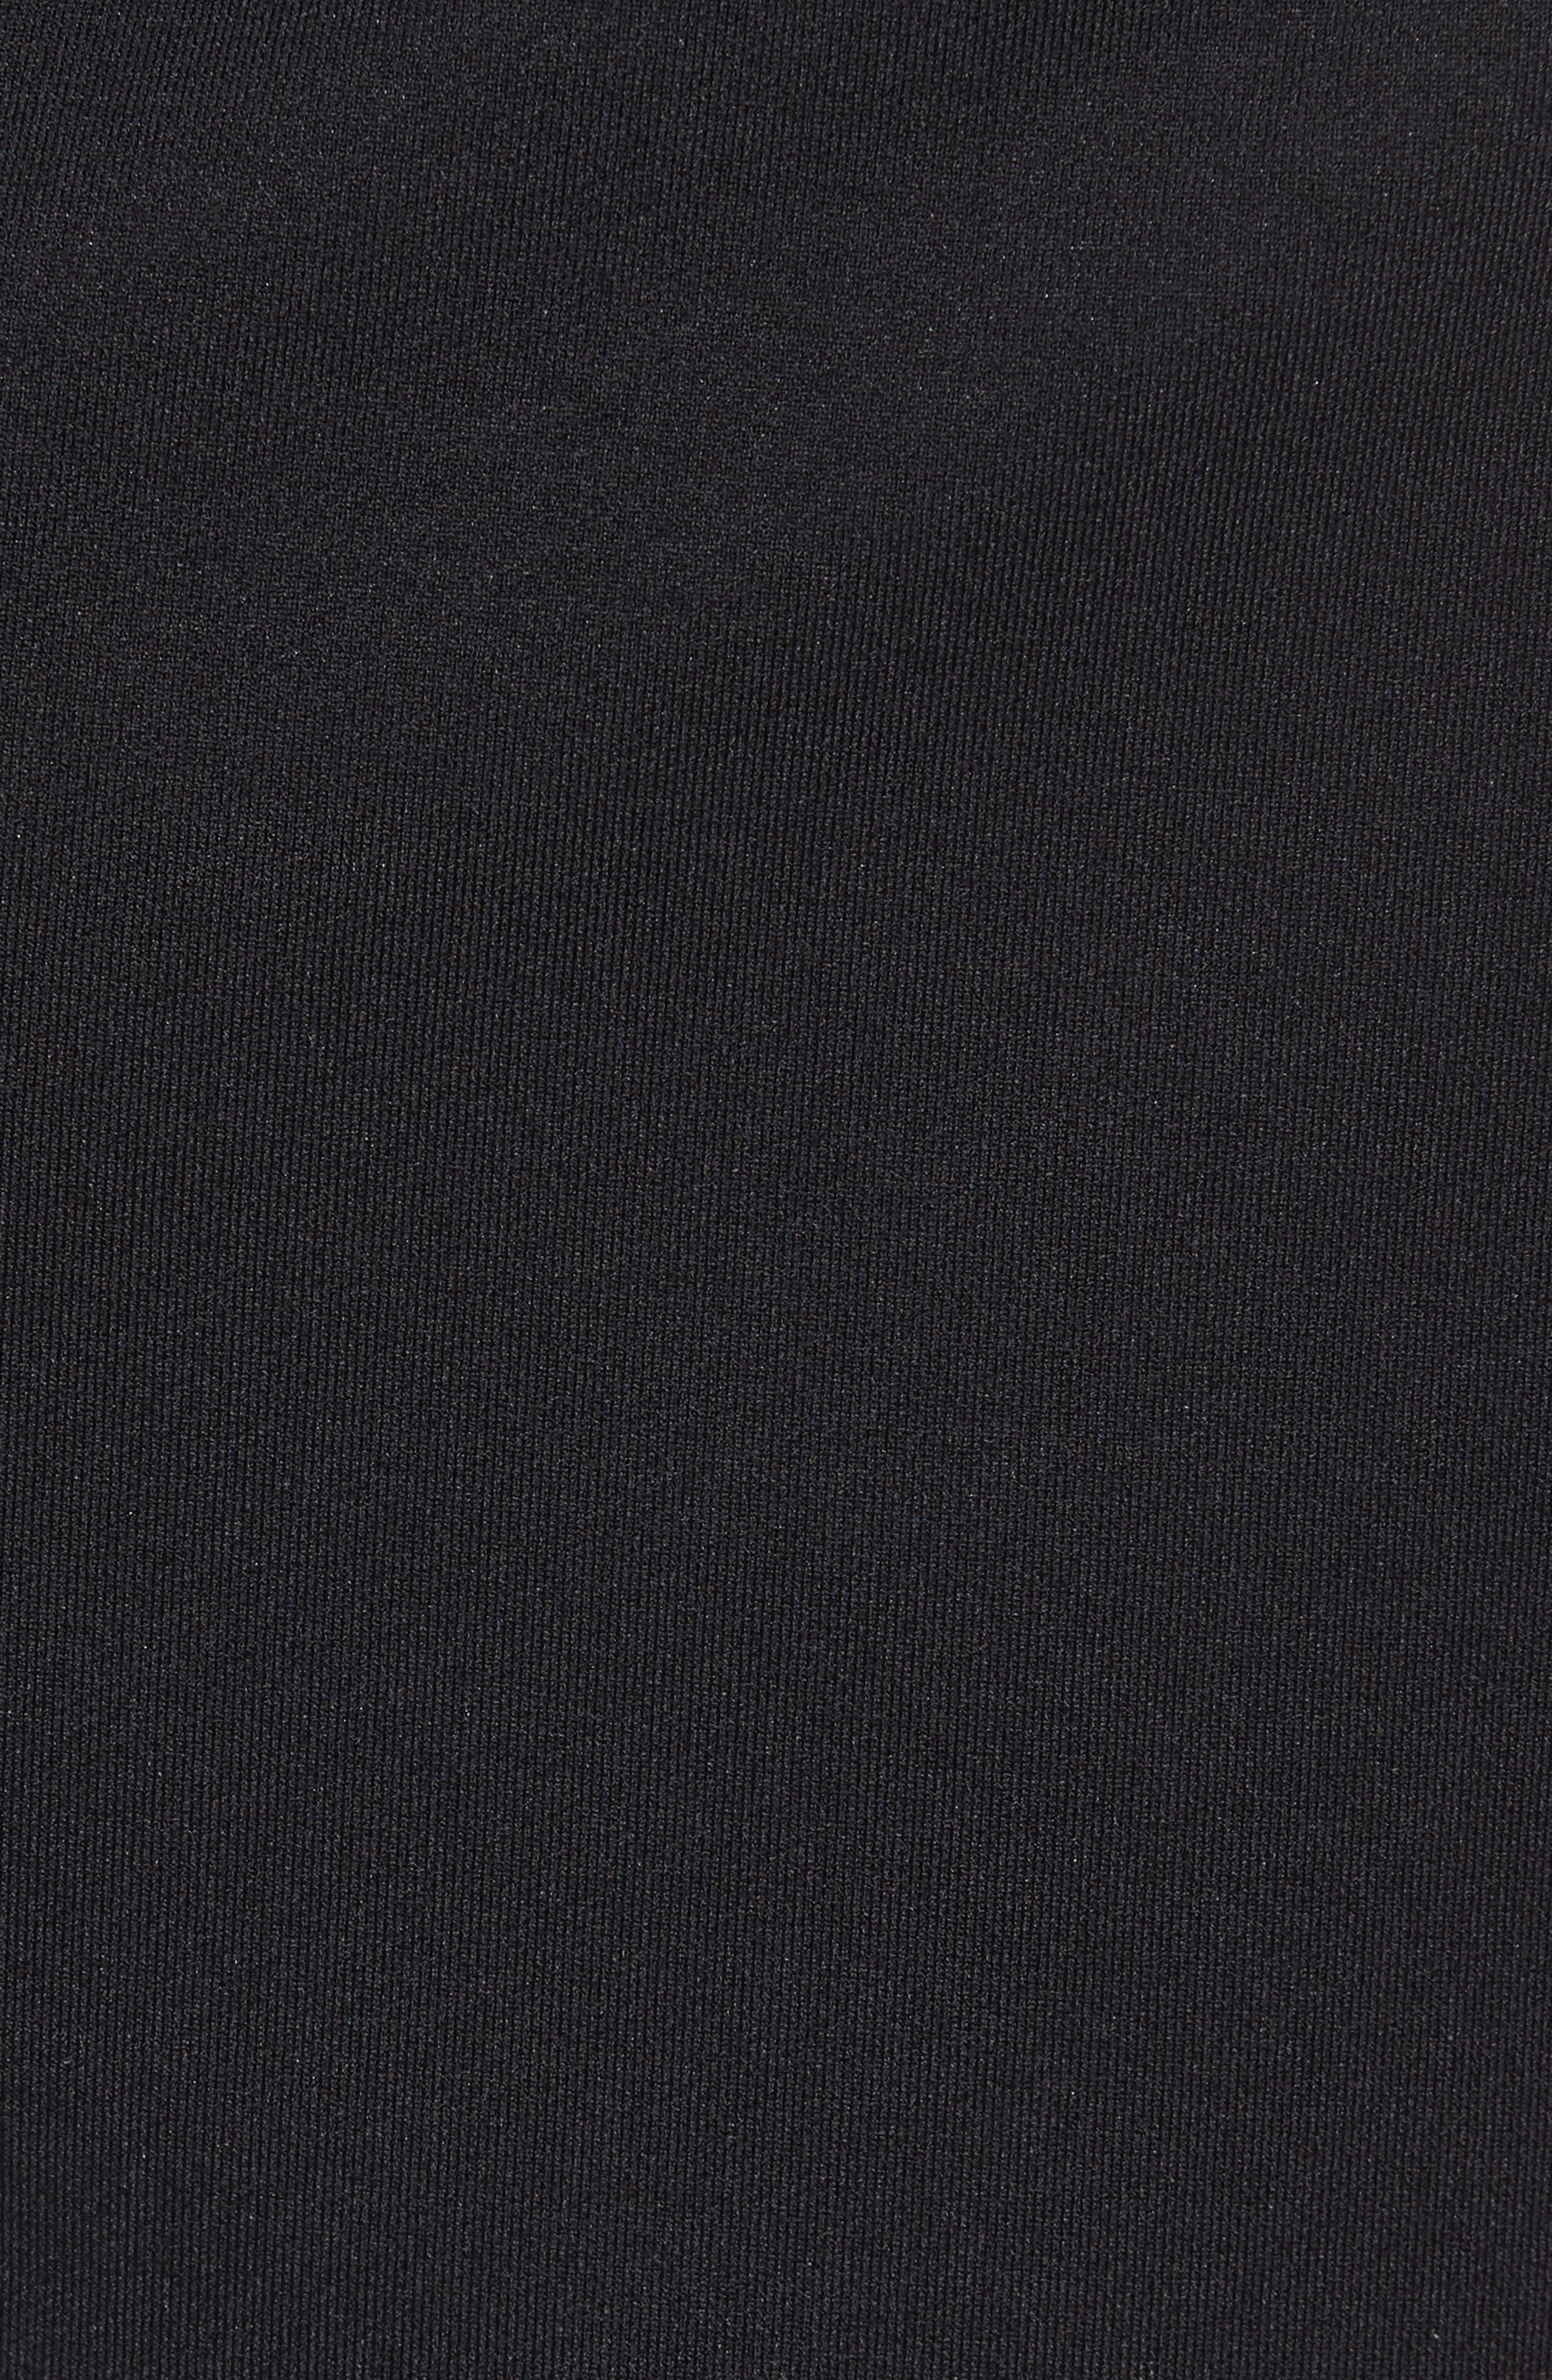 Everywear Jogger Pants,                             Alternate thumbnail 5, color,                             Black